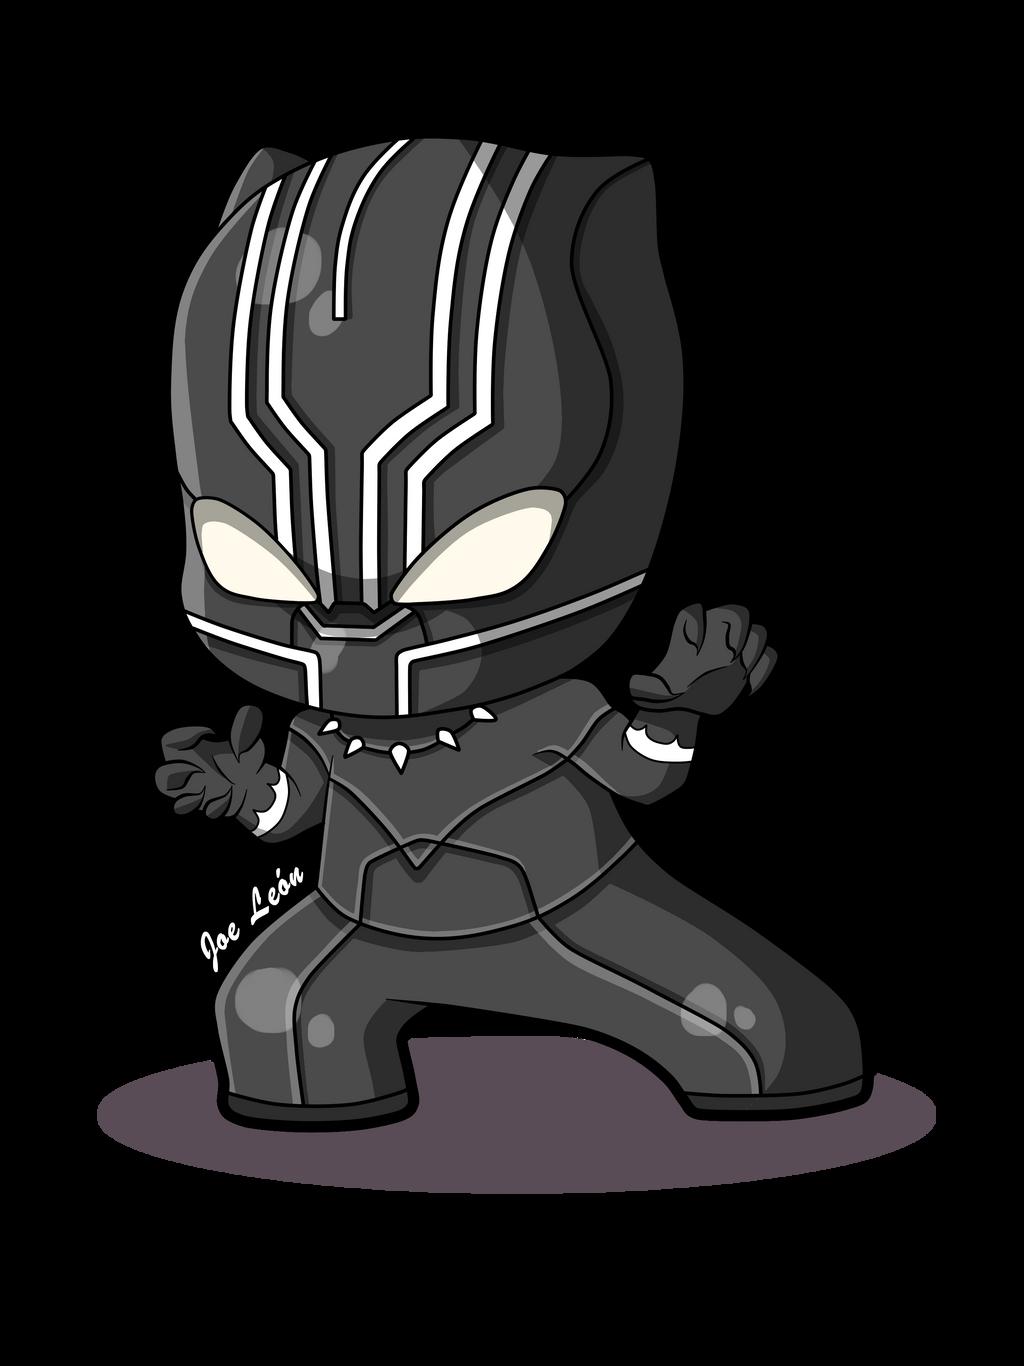 Black Panther By Joeleon On Deviantart In 2020 Marvel Cartoon Drawings Avengers Drawings Chibi Marvel